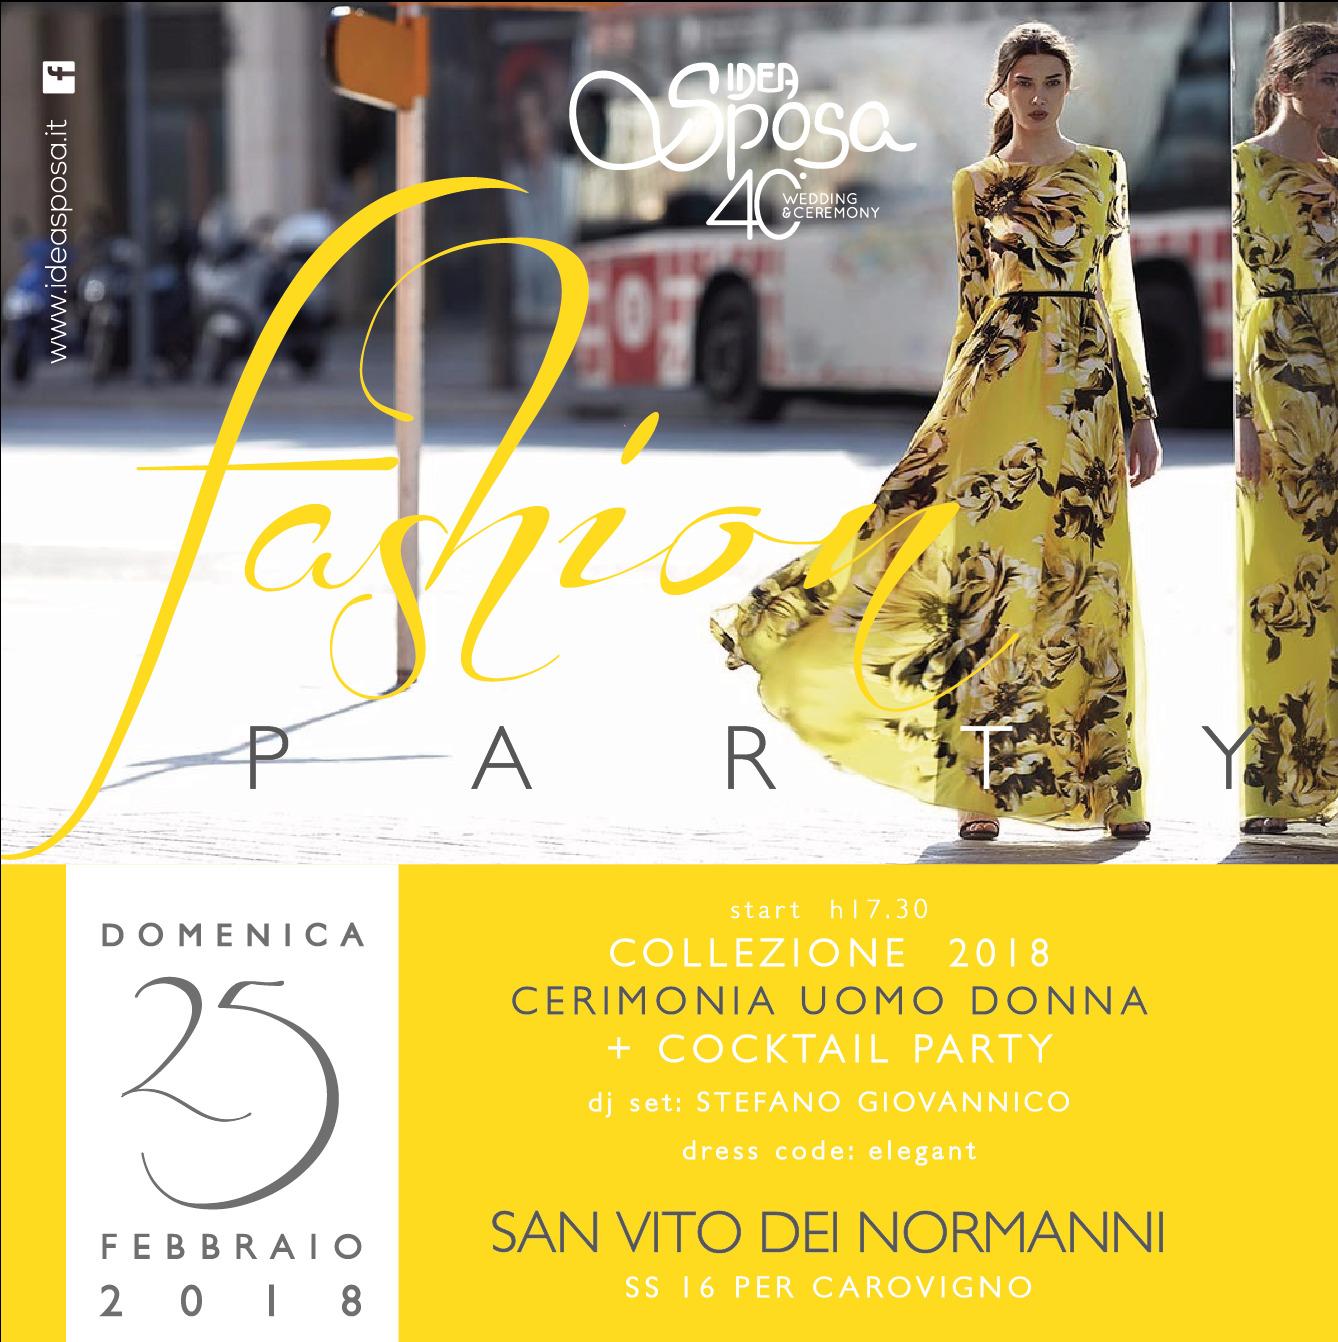 6ef9f609b954 Idea Sposa Fashion Party - Idea Sposa